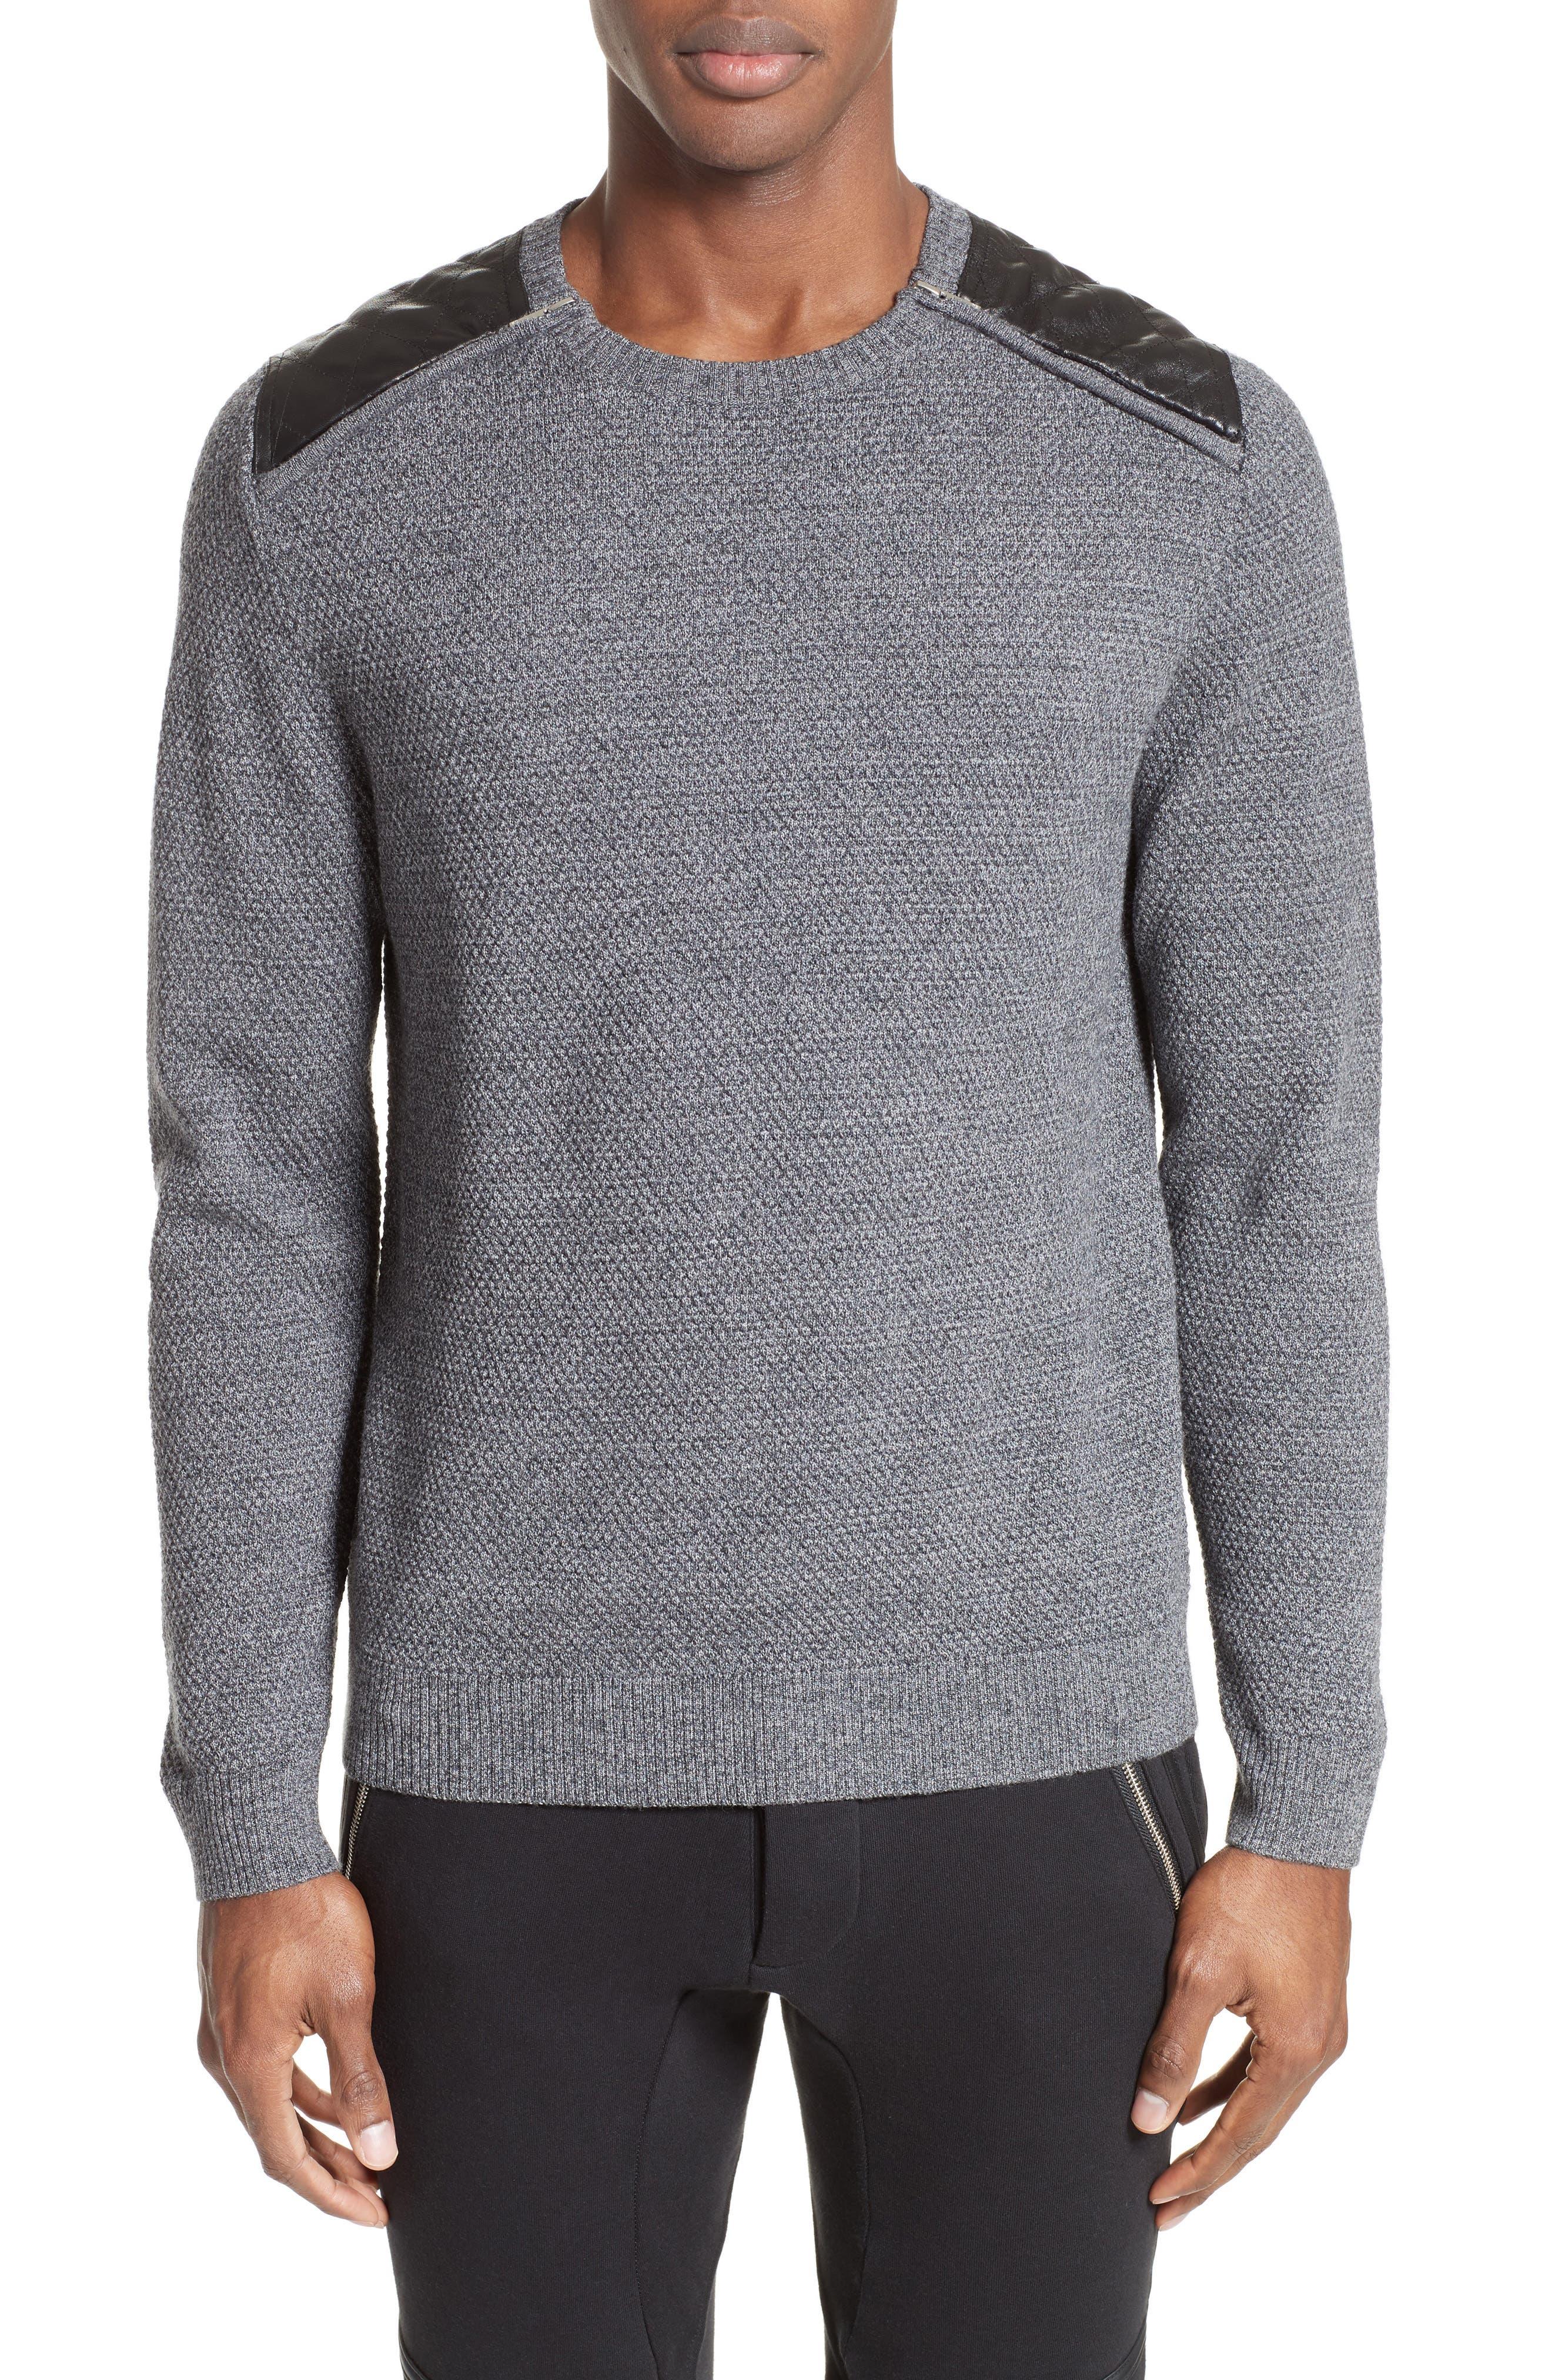 Merino Wool Sweater,                             Main thumbnail 1, color,                             020